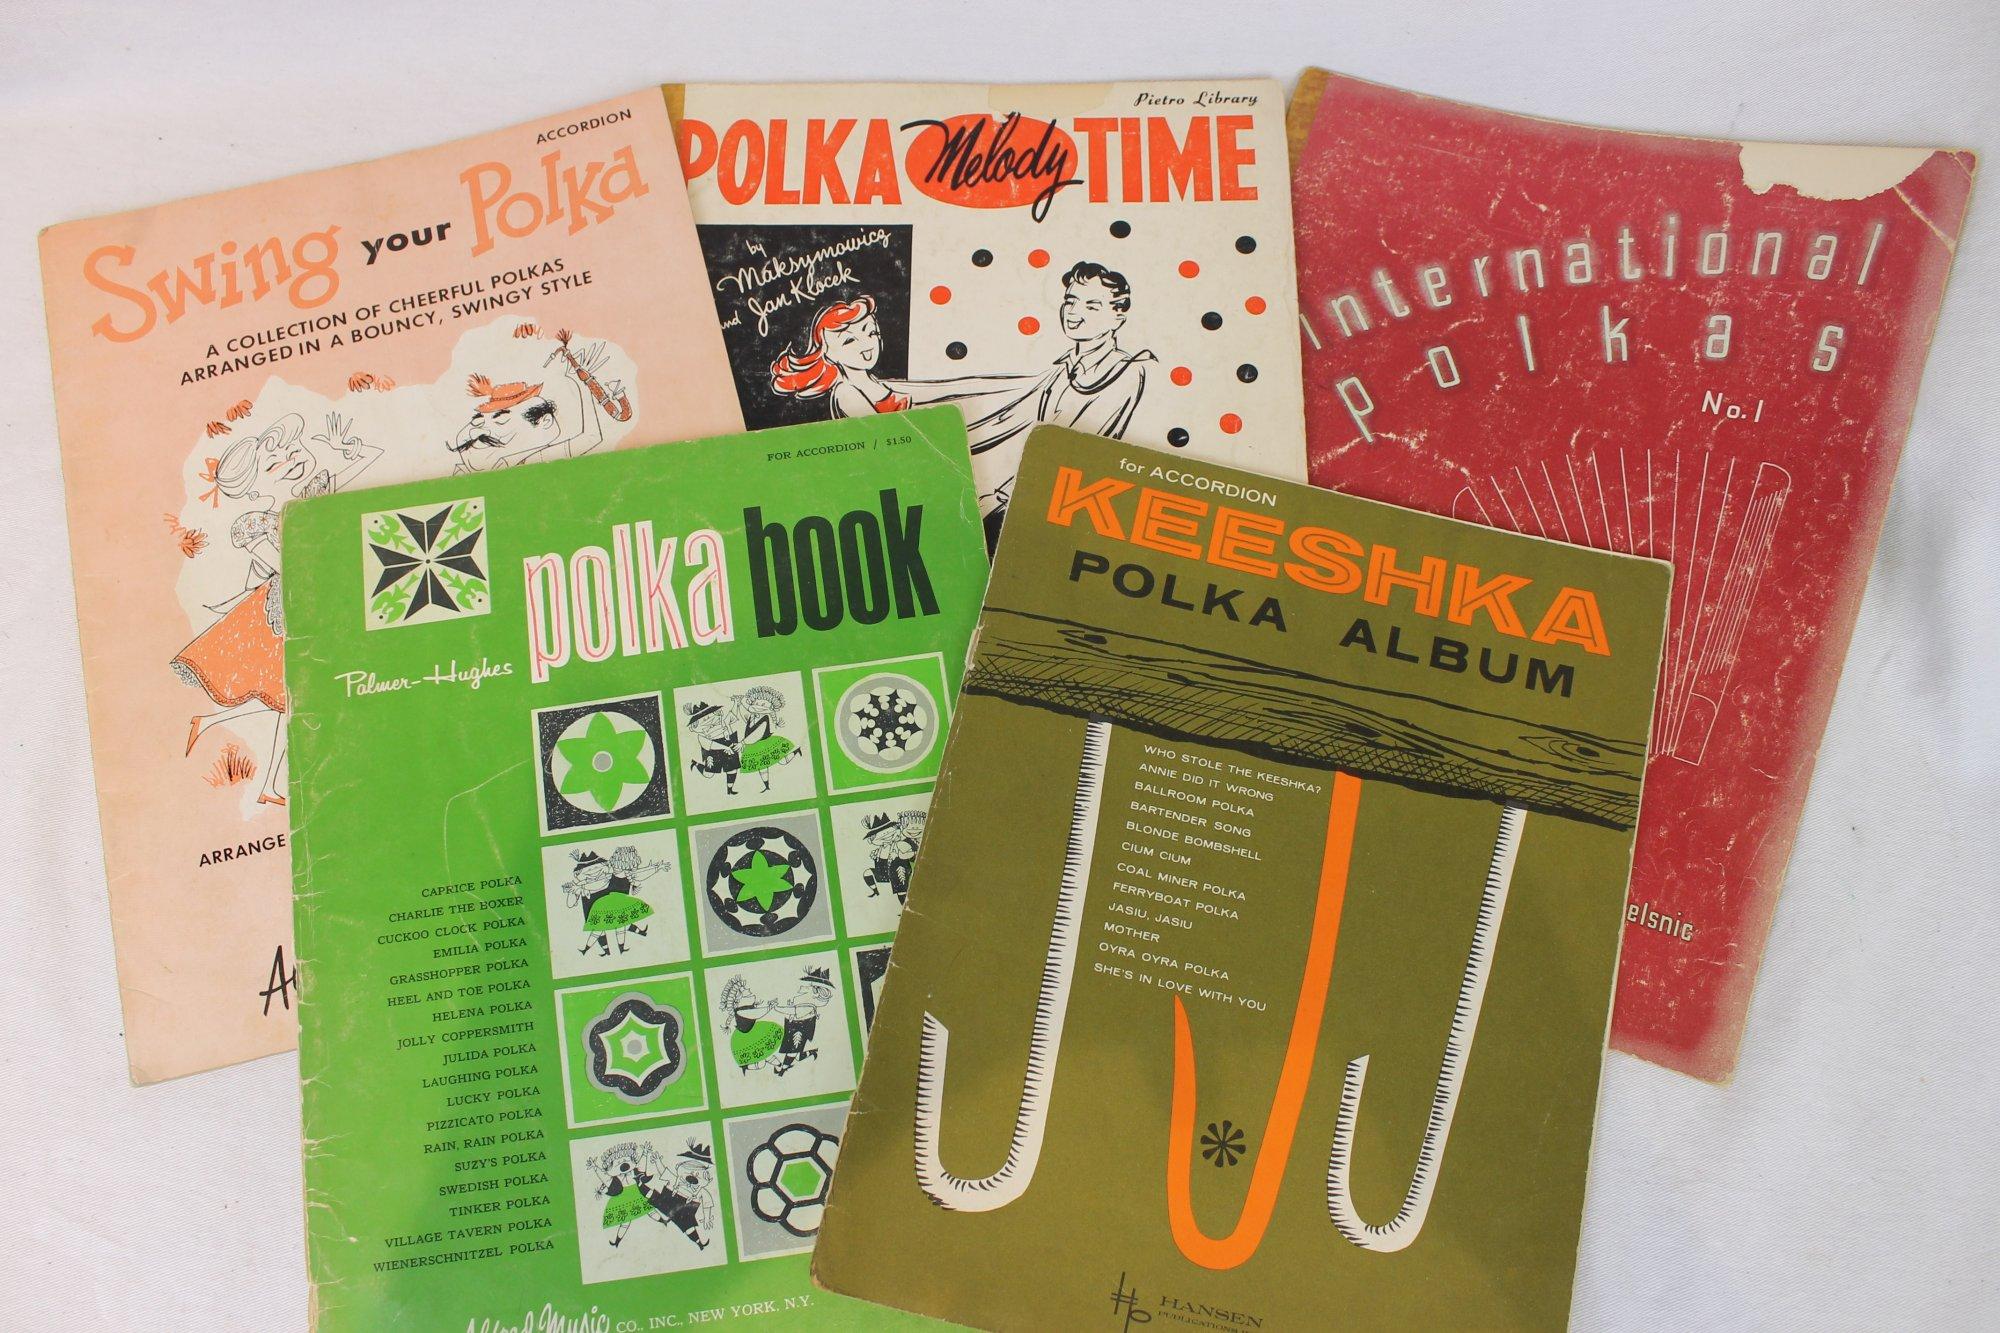 Lot of 5 Used Accordion Books - Polka Books